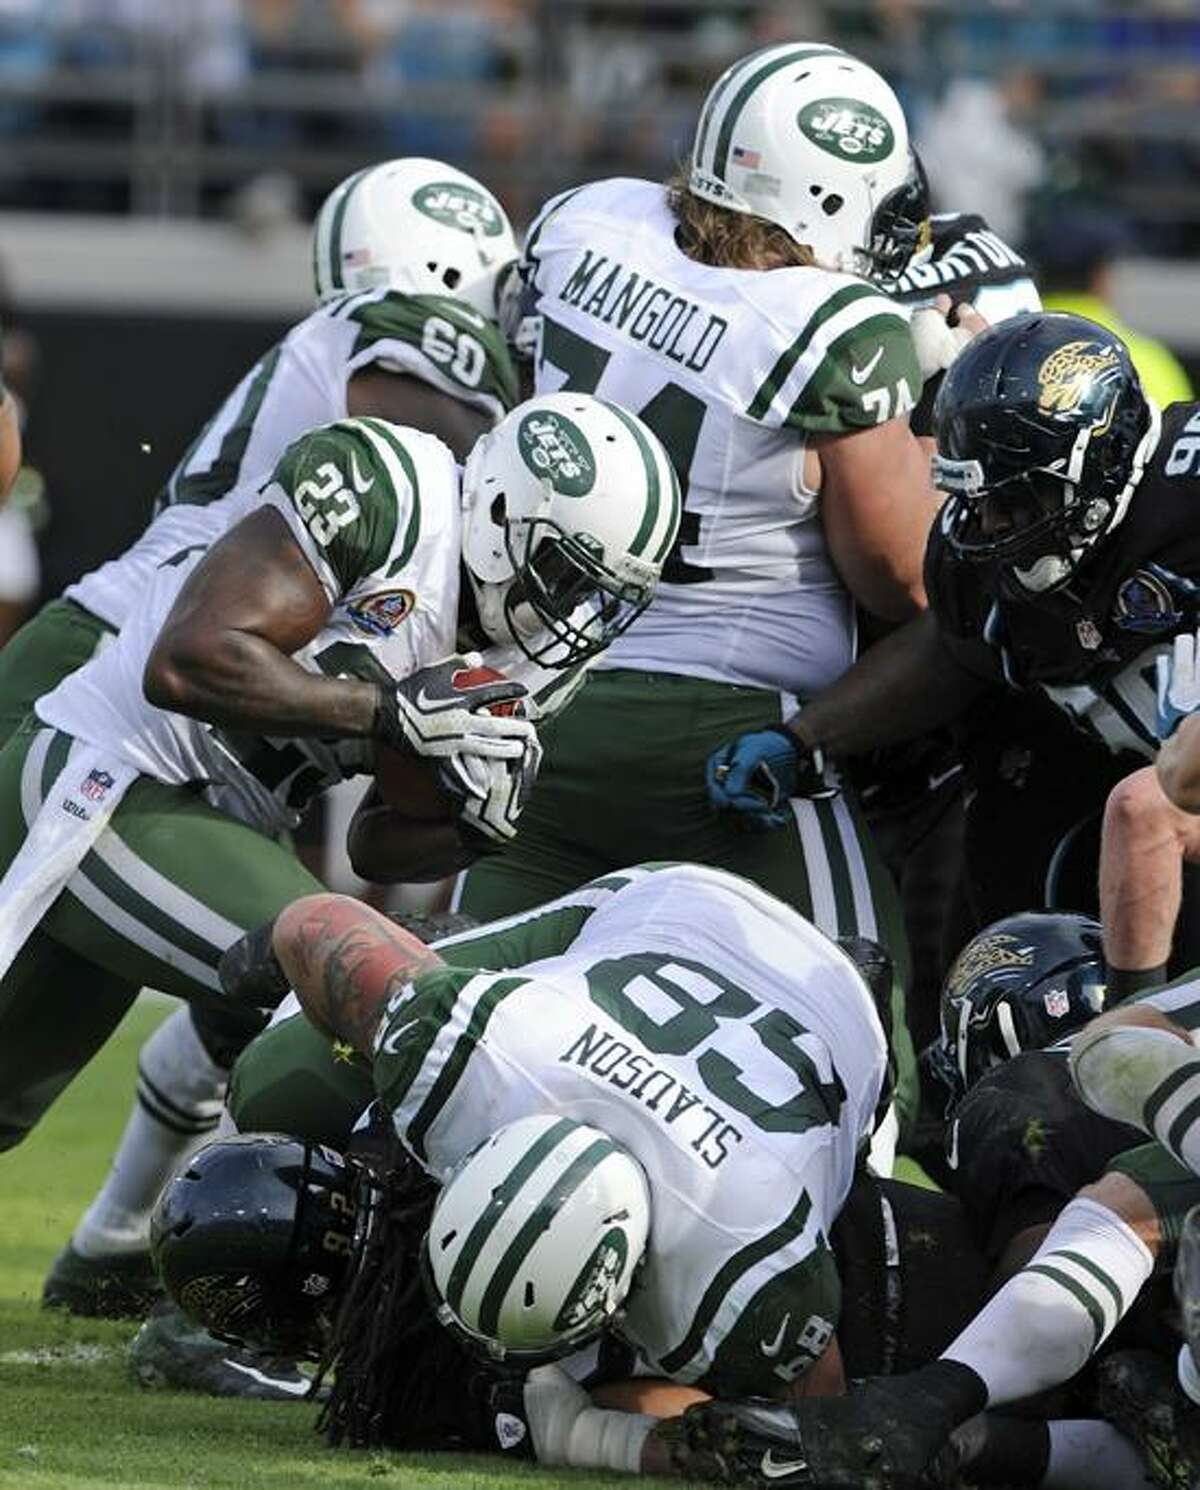 New York Jets running back Shonn Greene (23) runs a 1-yard touchdown past the Jacksonville Jaguars during the second half of an NFL football game, Sunday, Dec. 9, 2012, in Jacksonville, Fla. (AP Photo/Stephen Morton)